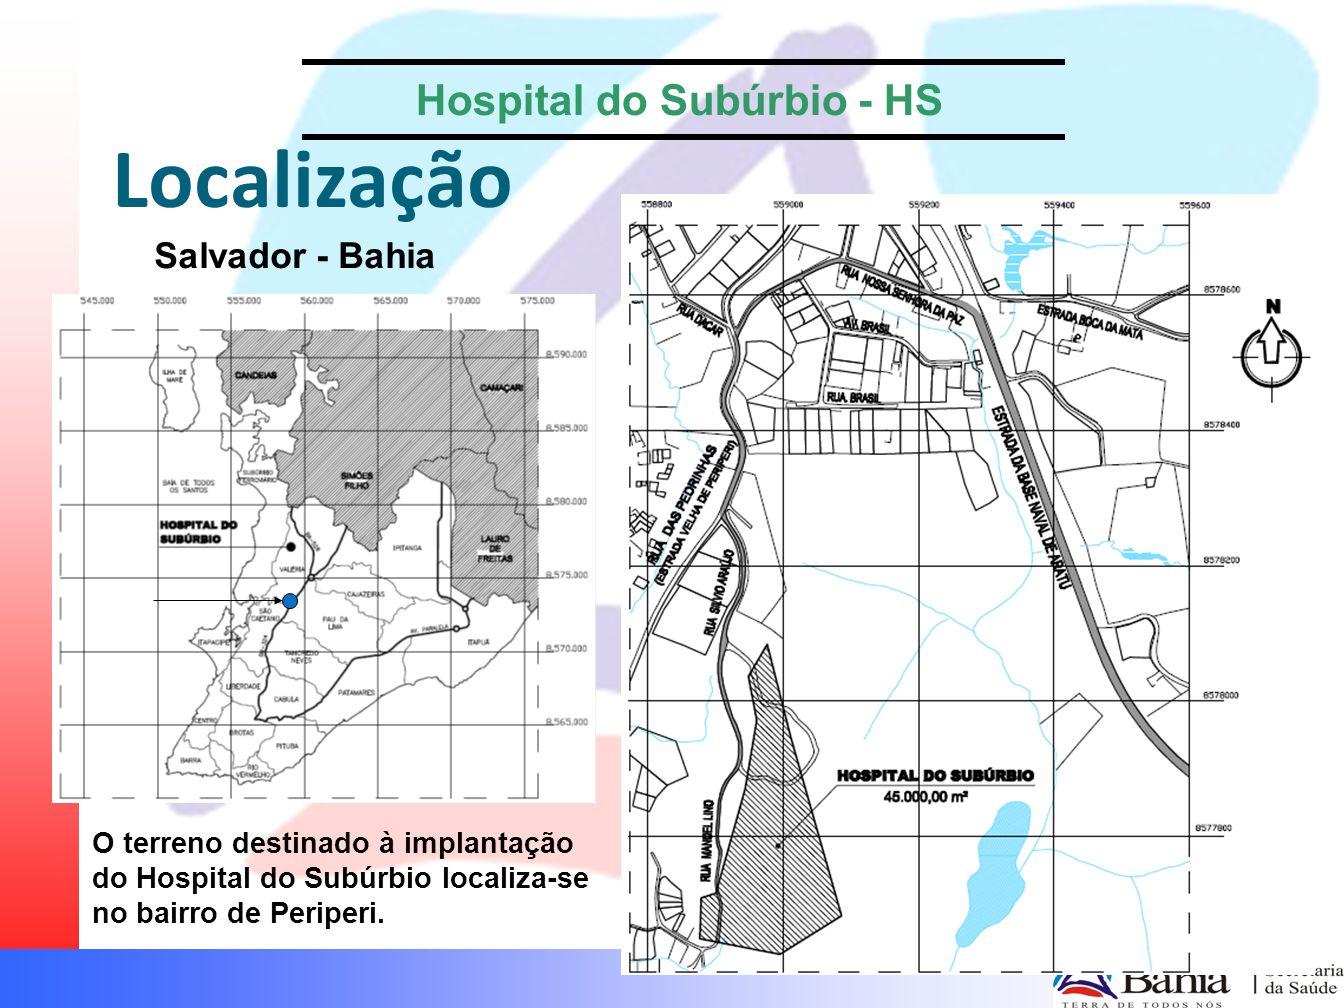 Fachada Principal Hospital do Subúrbio - HS